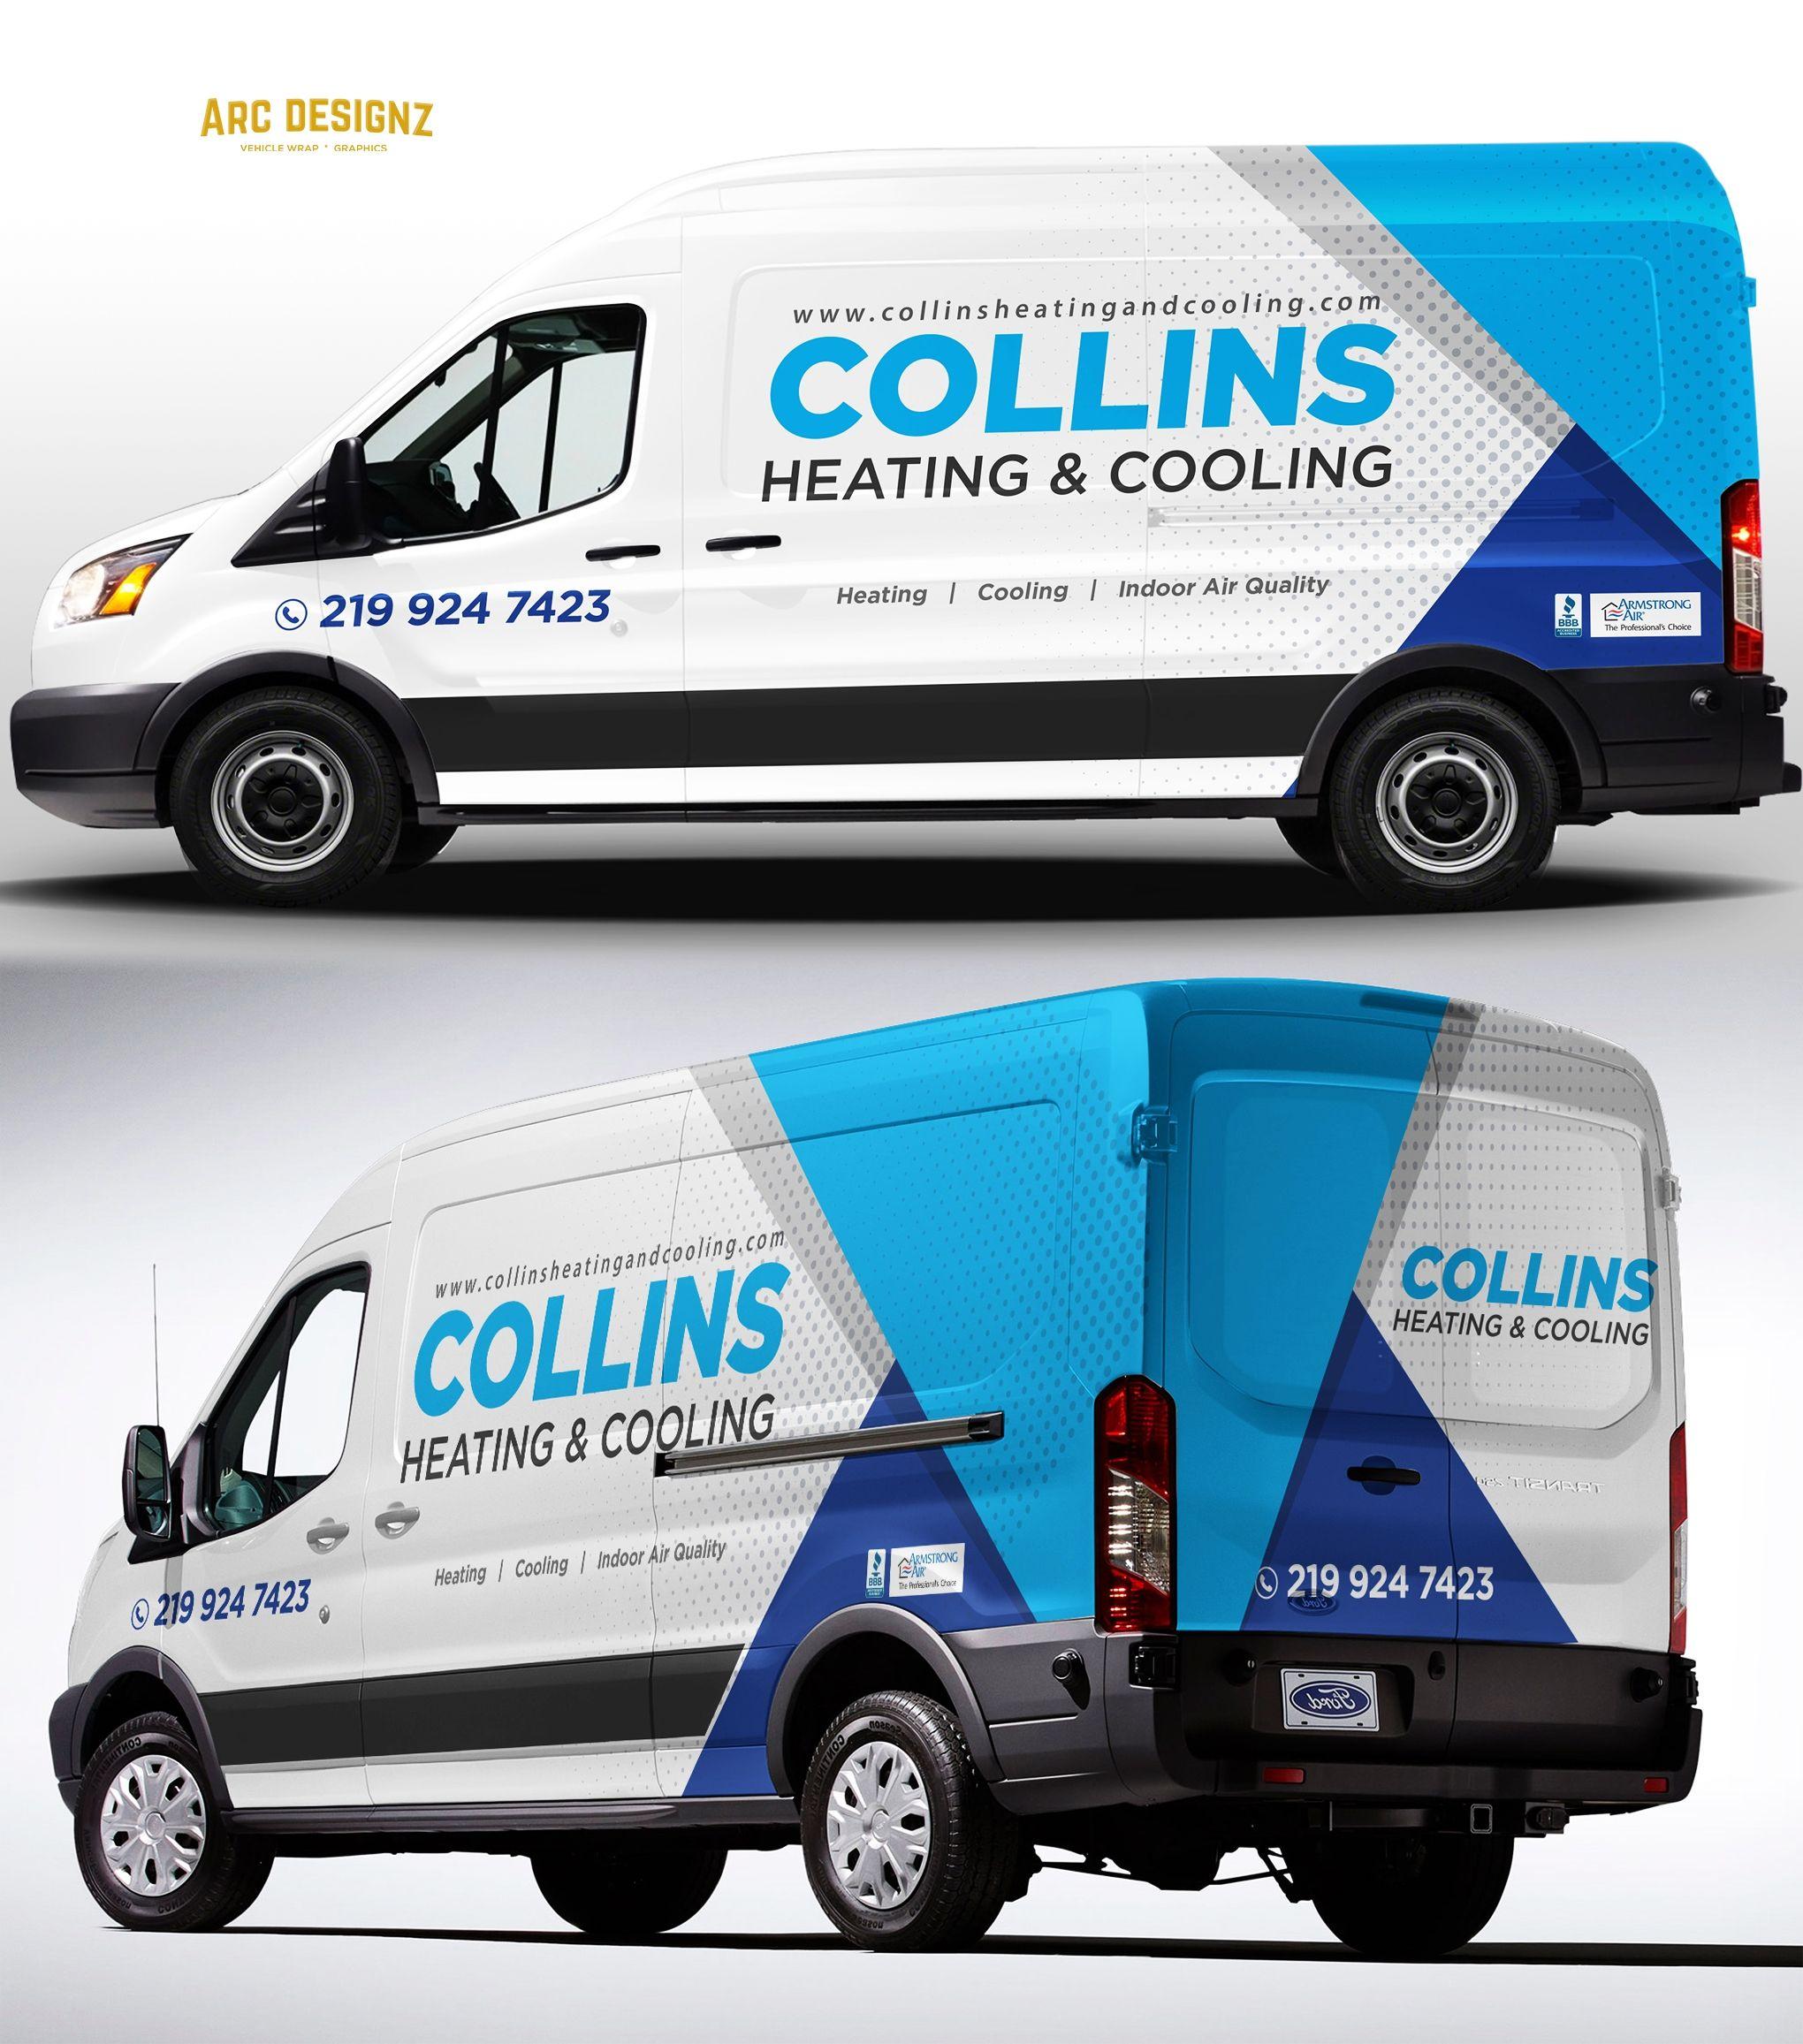 Collinshvac Picked A Winning Design In Their Car Truck Or Van